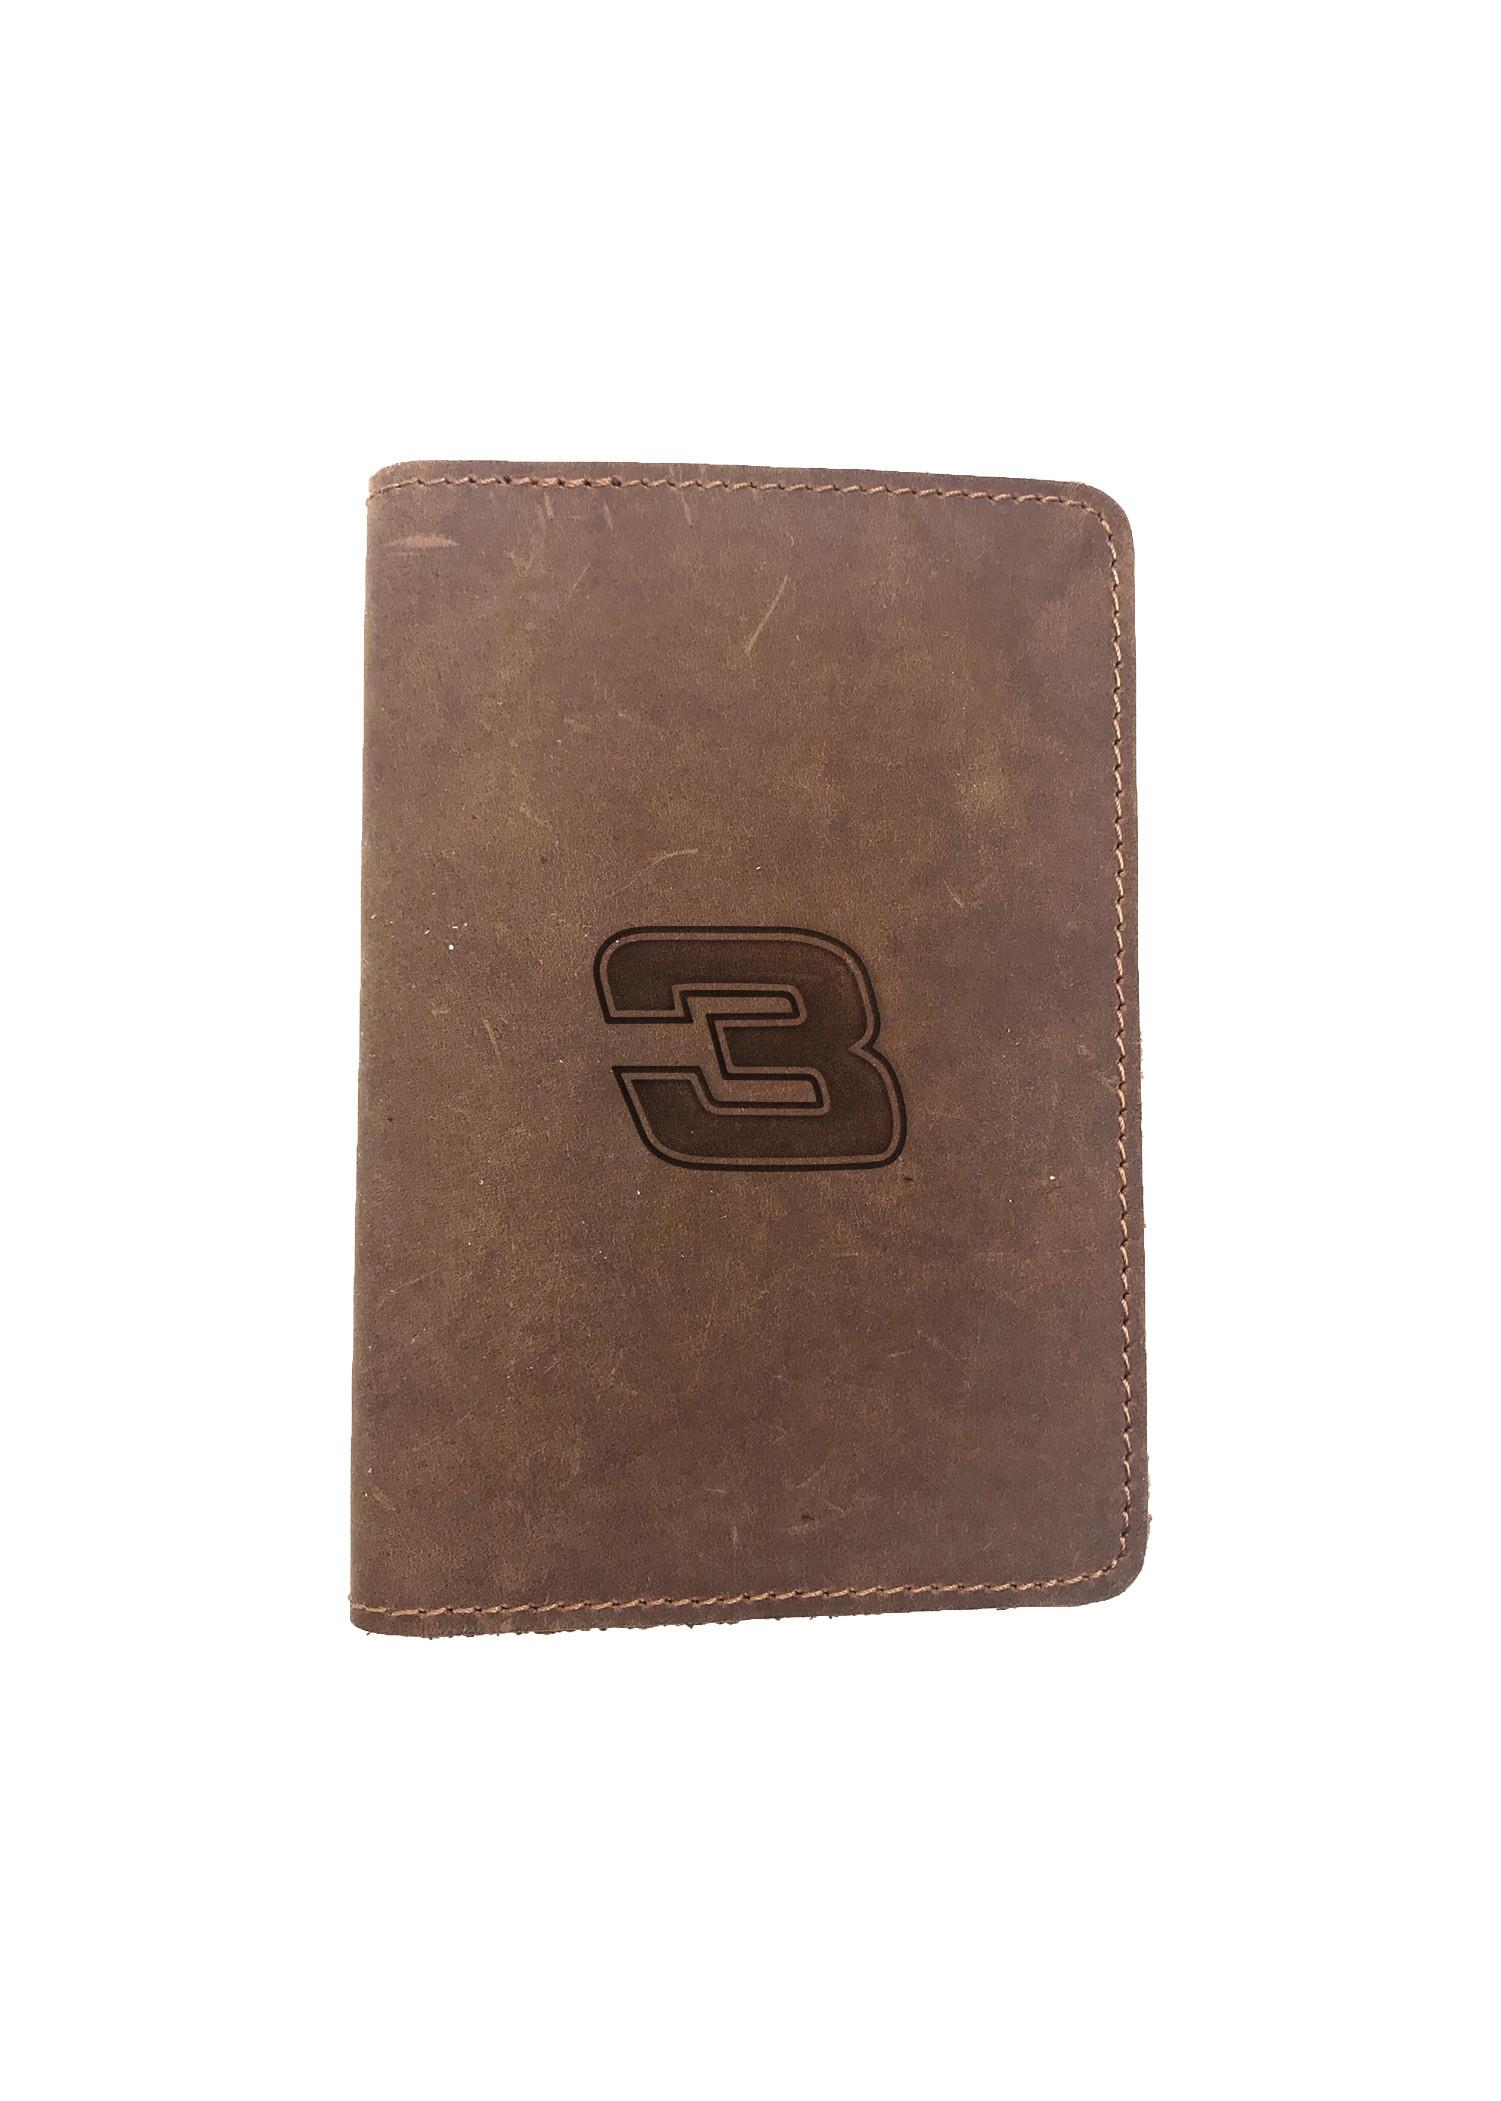 Passport Cover Bao Da Hộ Chiếu Da Sáp Khắc Hình Số 3 NASCAR (BROWN)